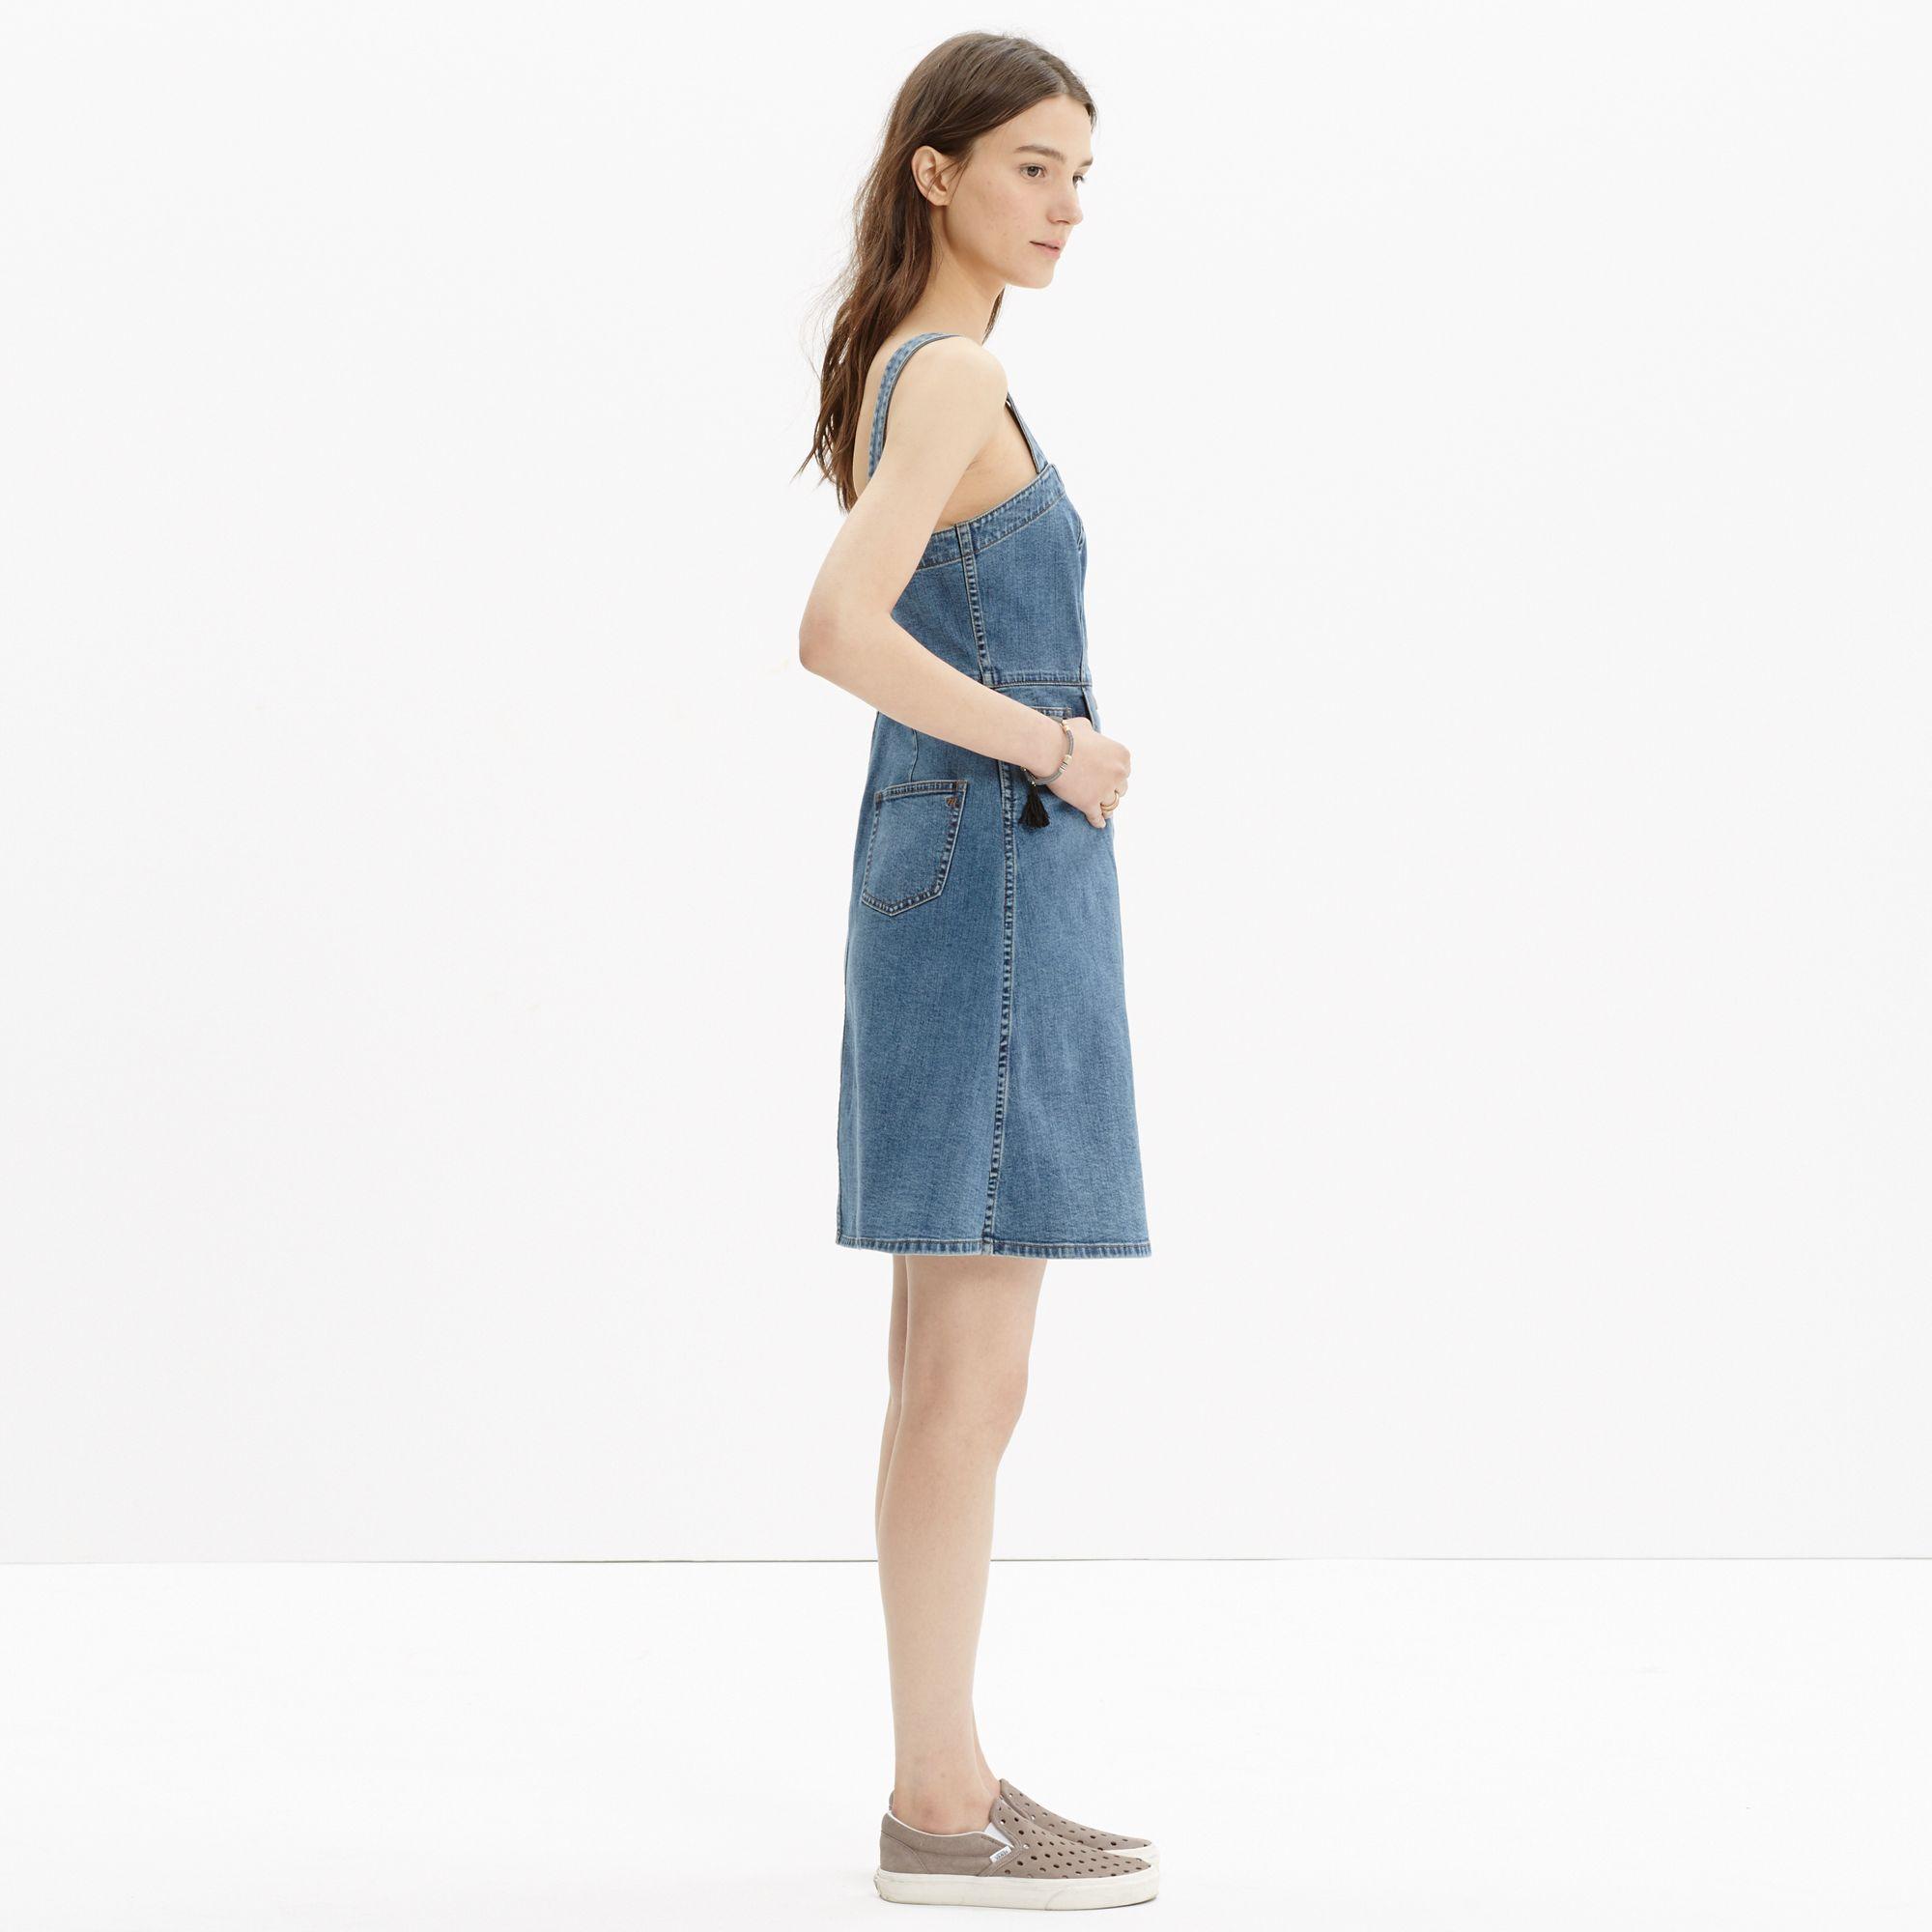 d32d87c2182 Lyst - Madewell Denim Overall Dress in Blue